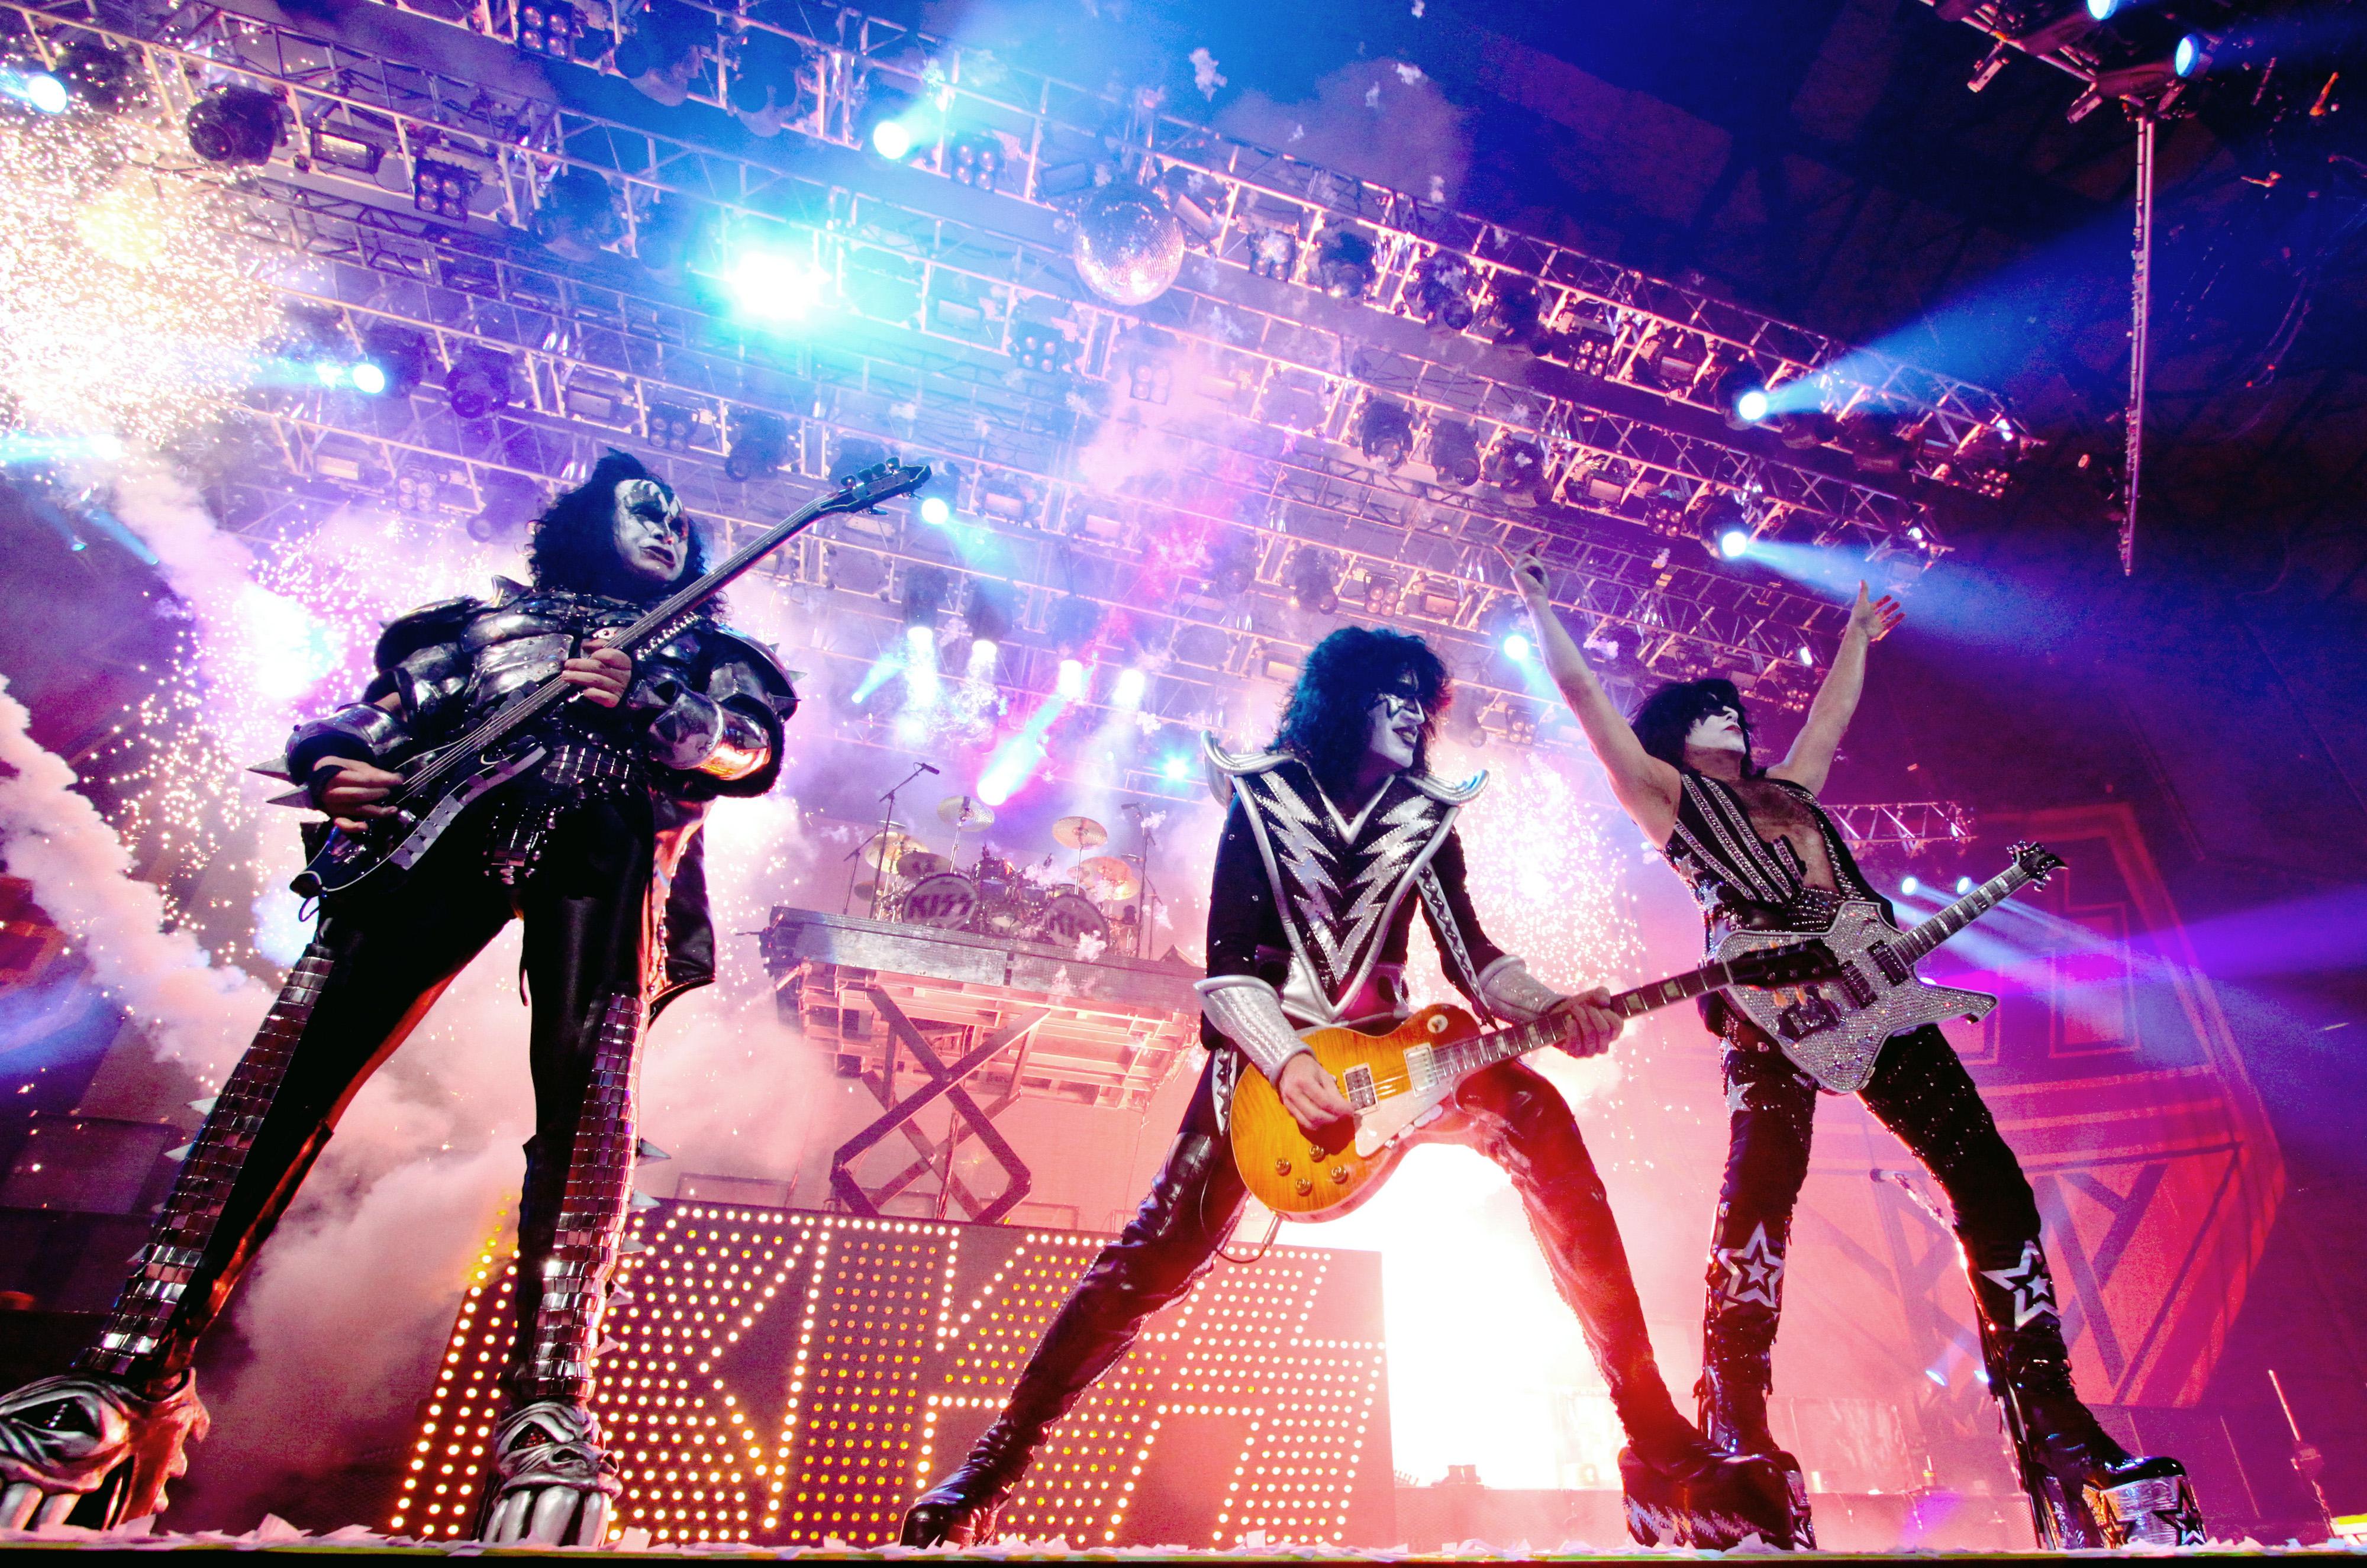 Kiss heavy metal rock bands concert guitar k wallpaper background 4000x2650